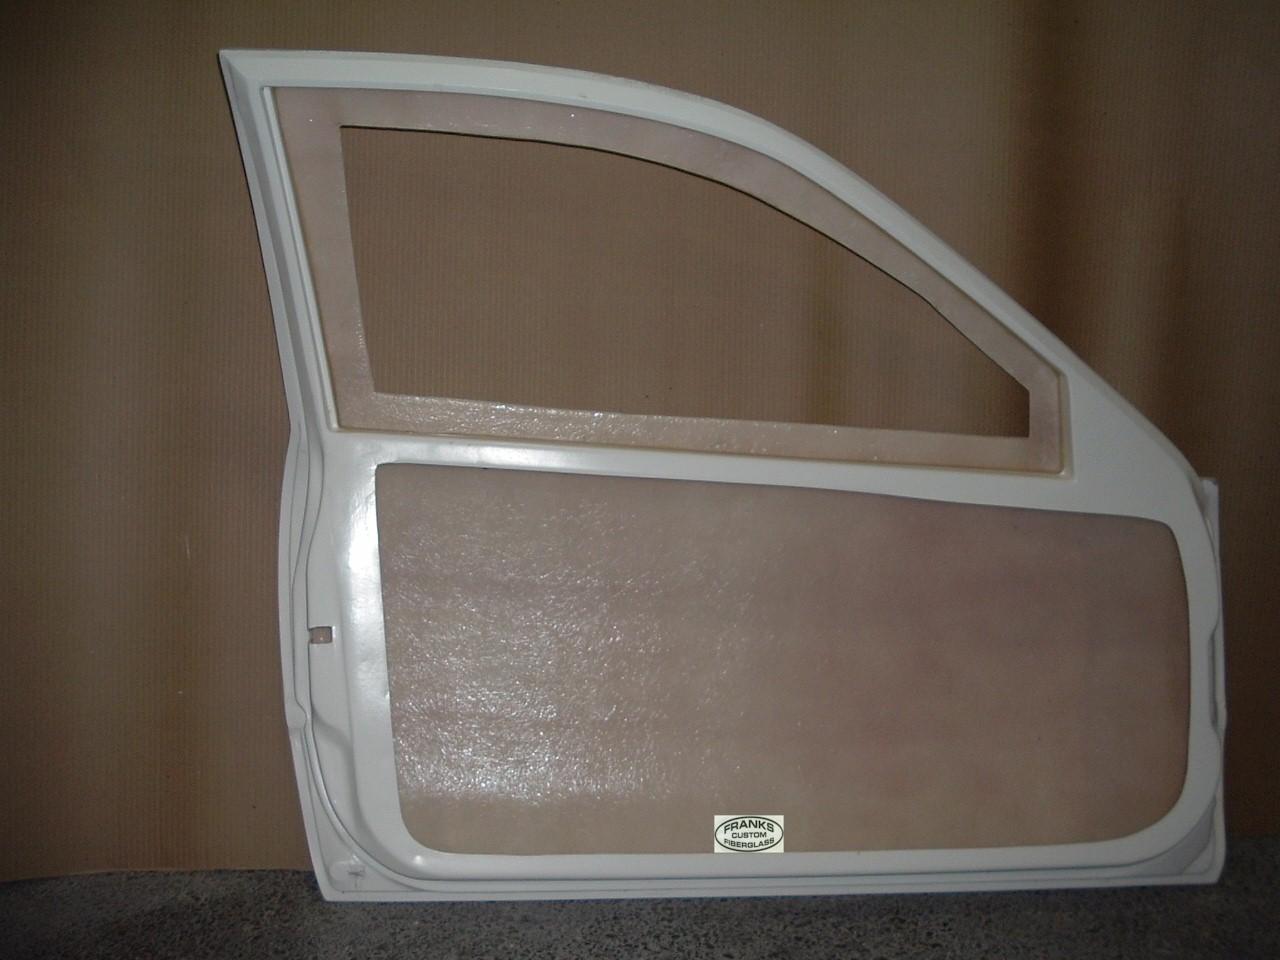 960 #3E342A 92 95 Civic Door Inside View save image Custom Fiberglass Doors 45971280